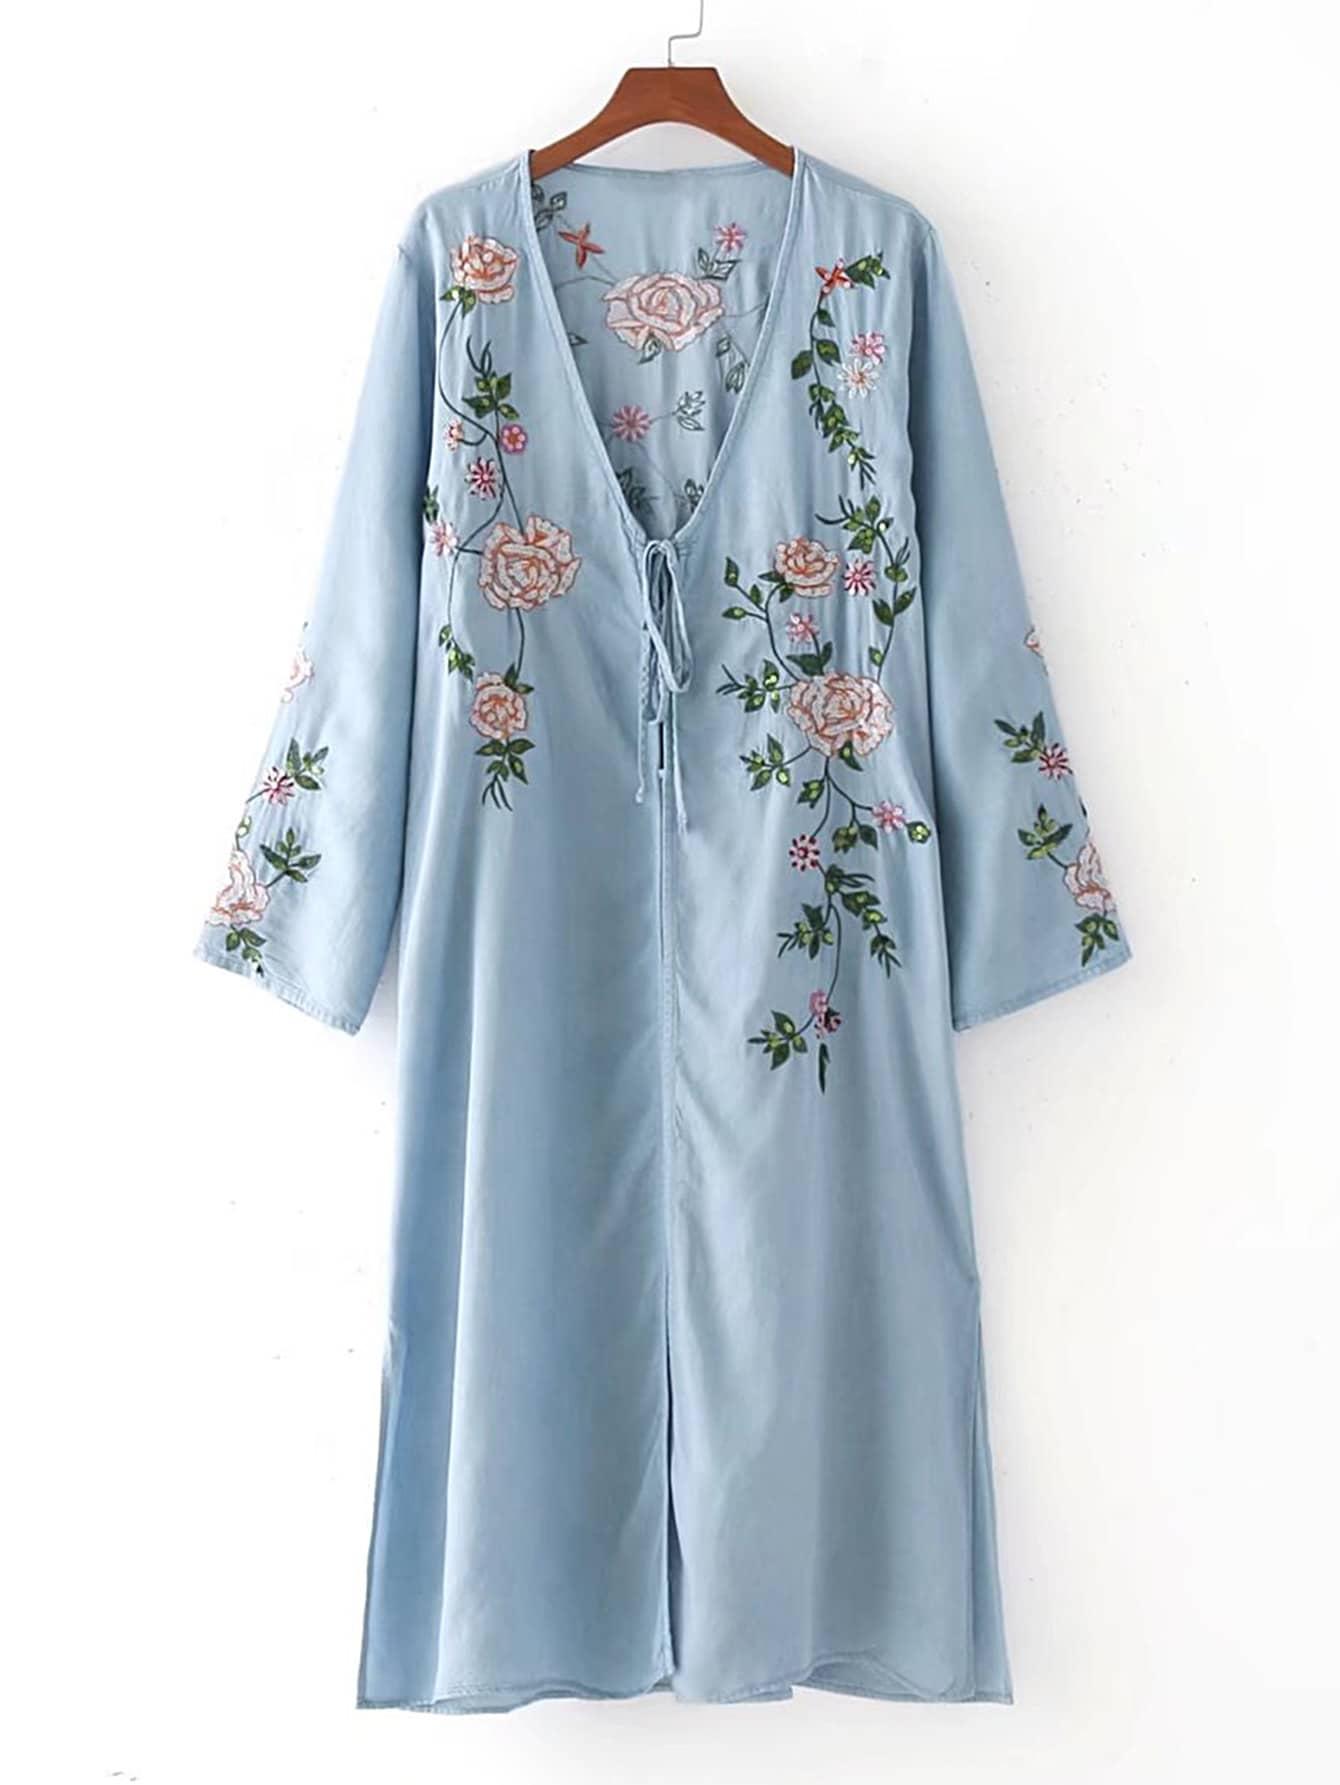 Flower embroidery lace up detail split dress shein sheinside